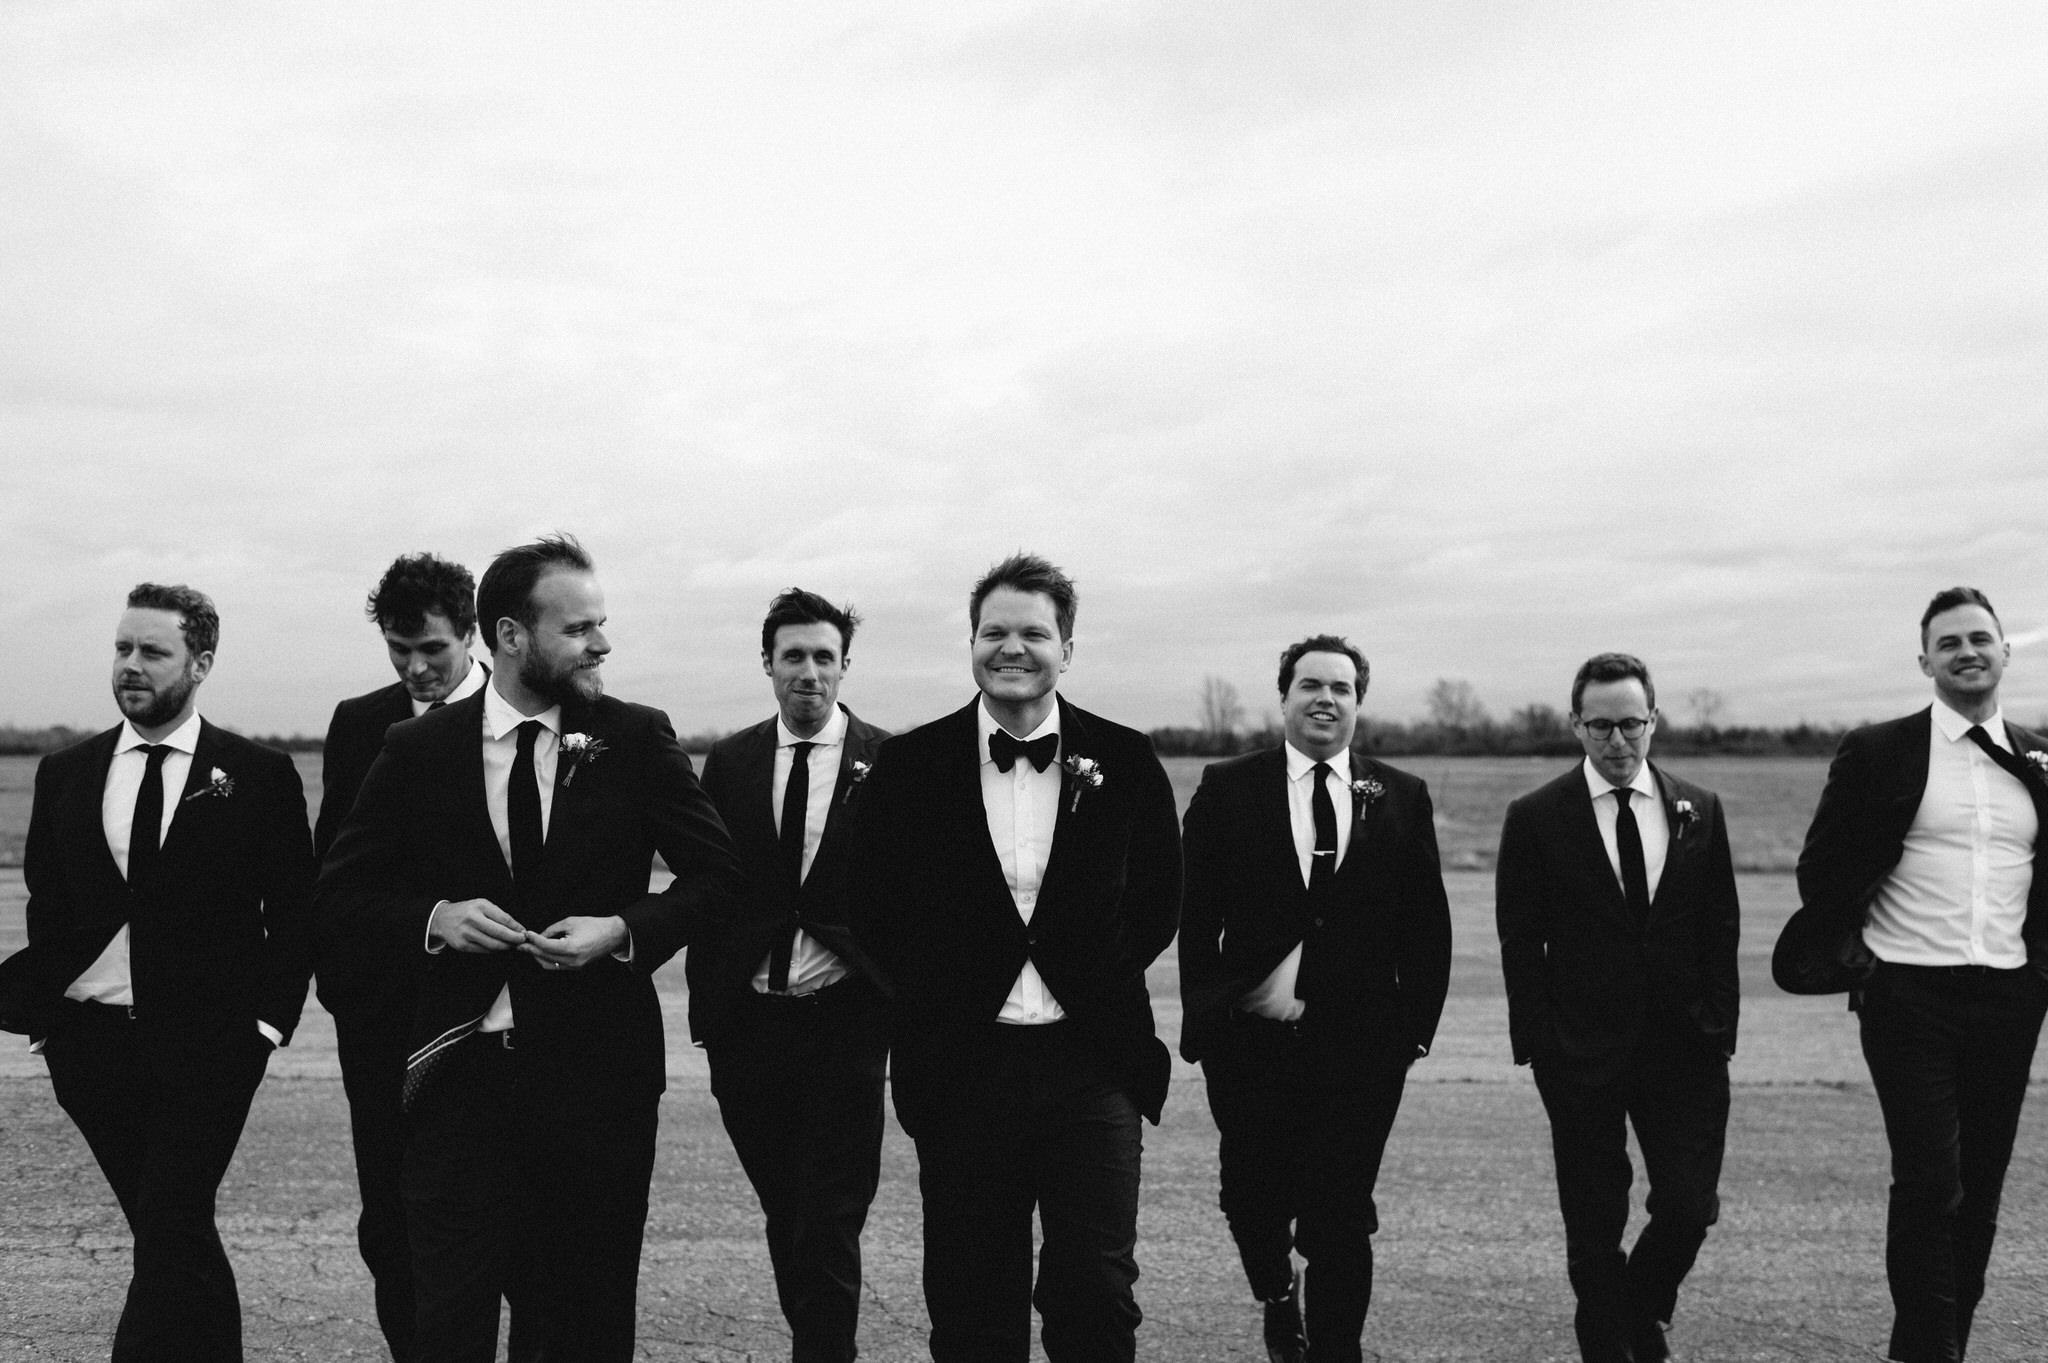 scarletoneillphotography_weddingphotography_prince edward county weddings063.JPG